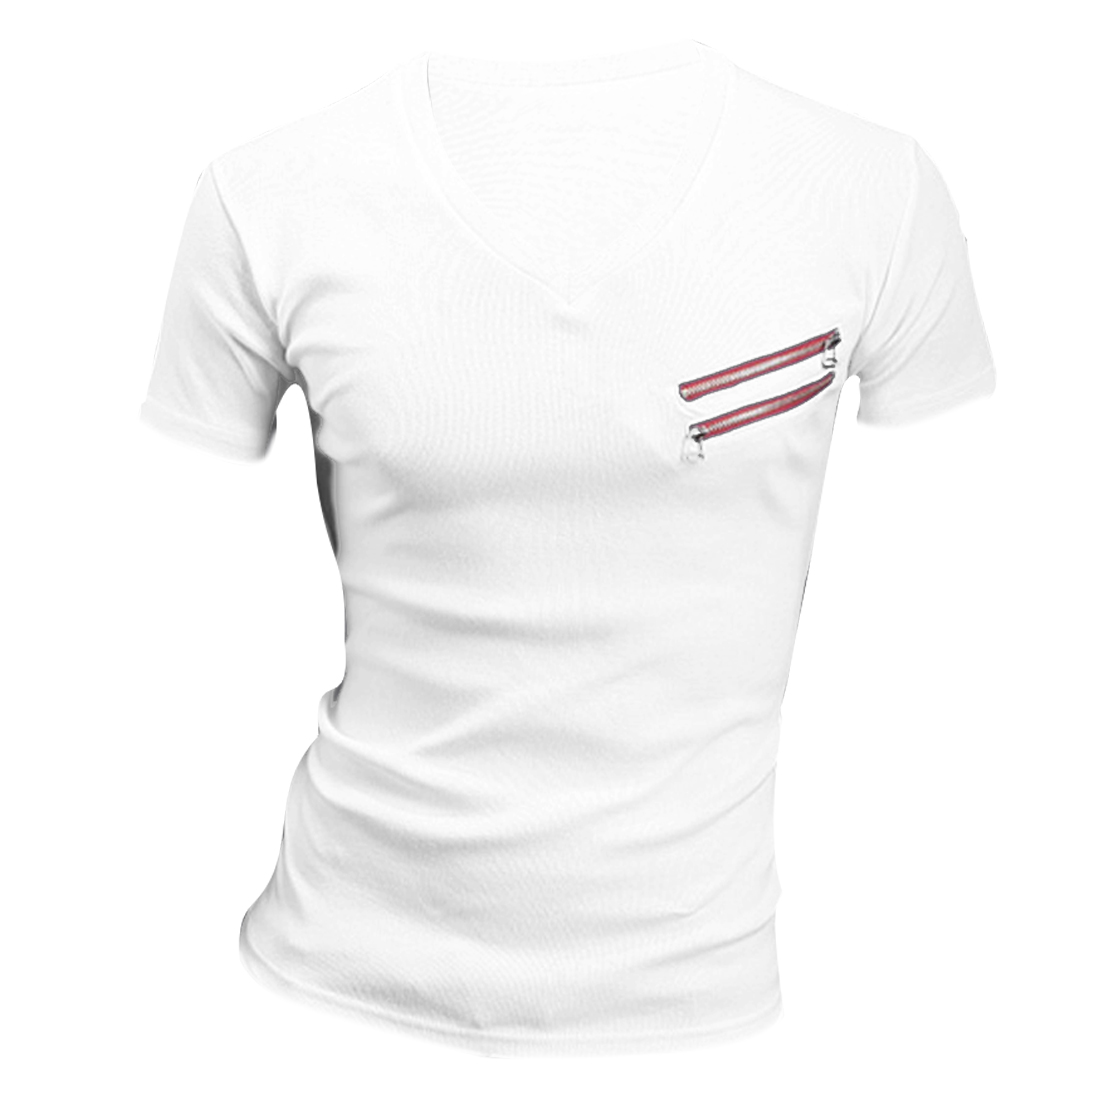 Men Chic V Neck Short Sleeve Slant Zipper Front Decor Slim Fit White Shirt M